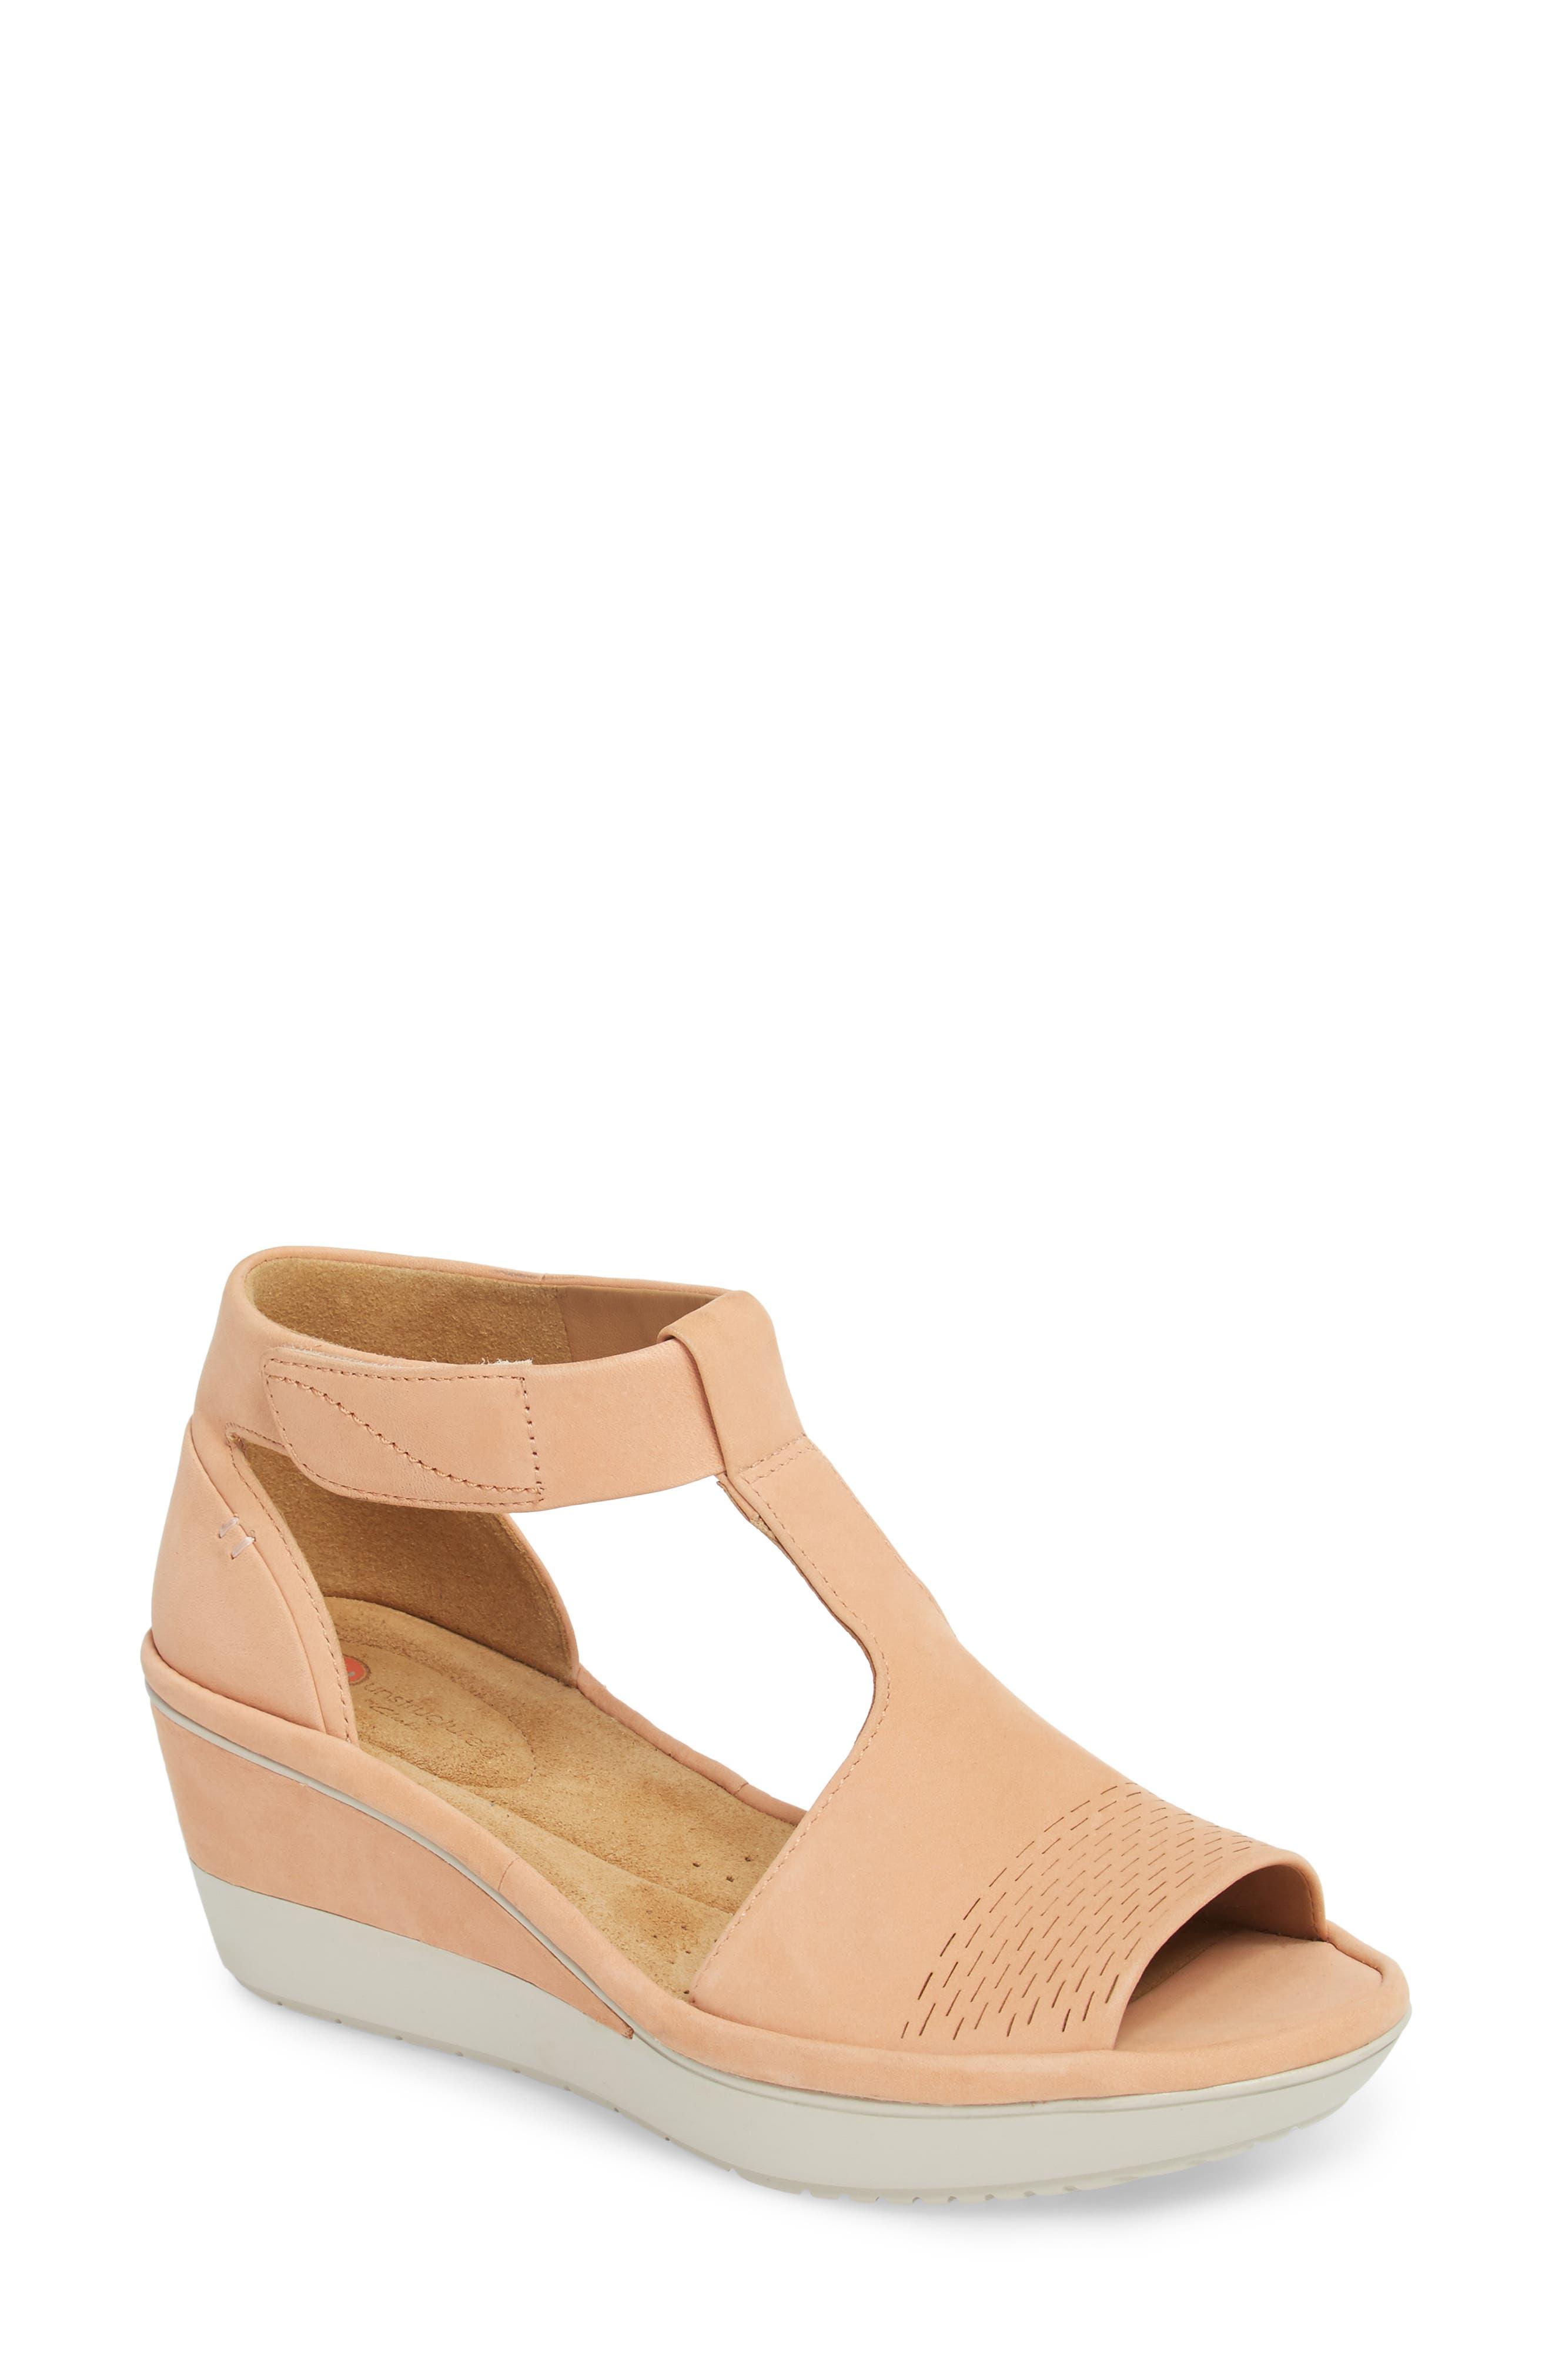 Wynnmere Avah T-Strap Wedge Sandal,                         Main,                         color, Peach Nubuck